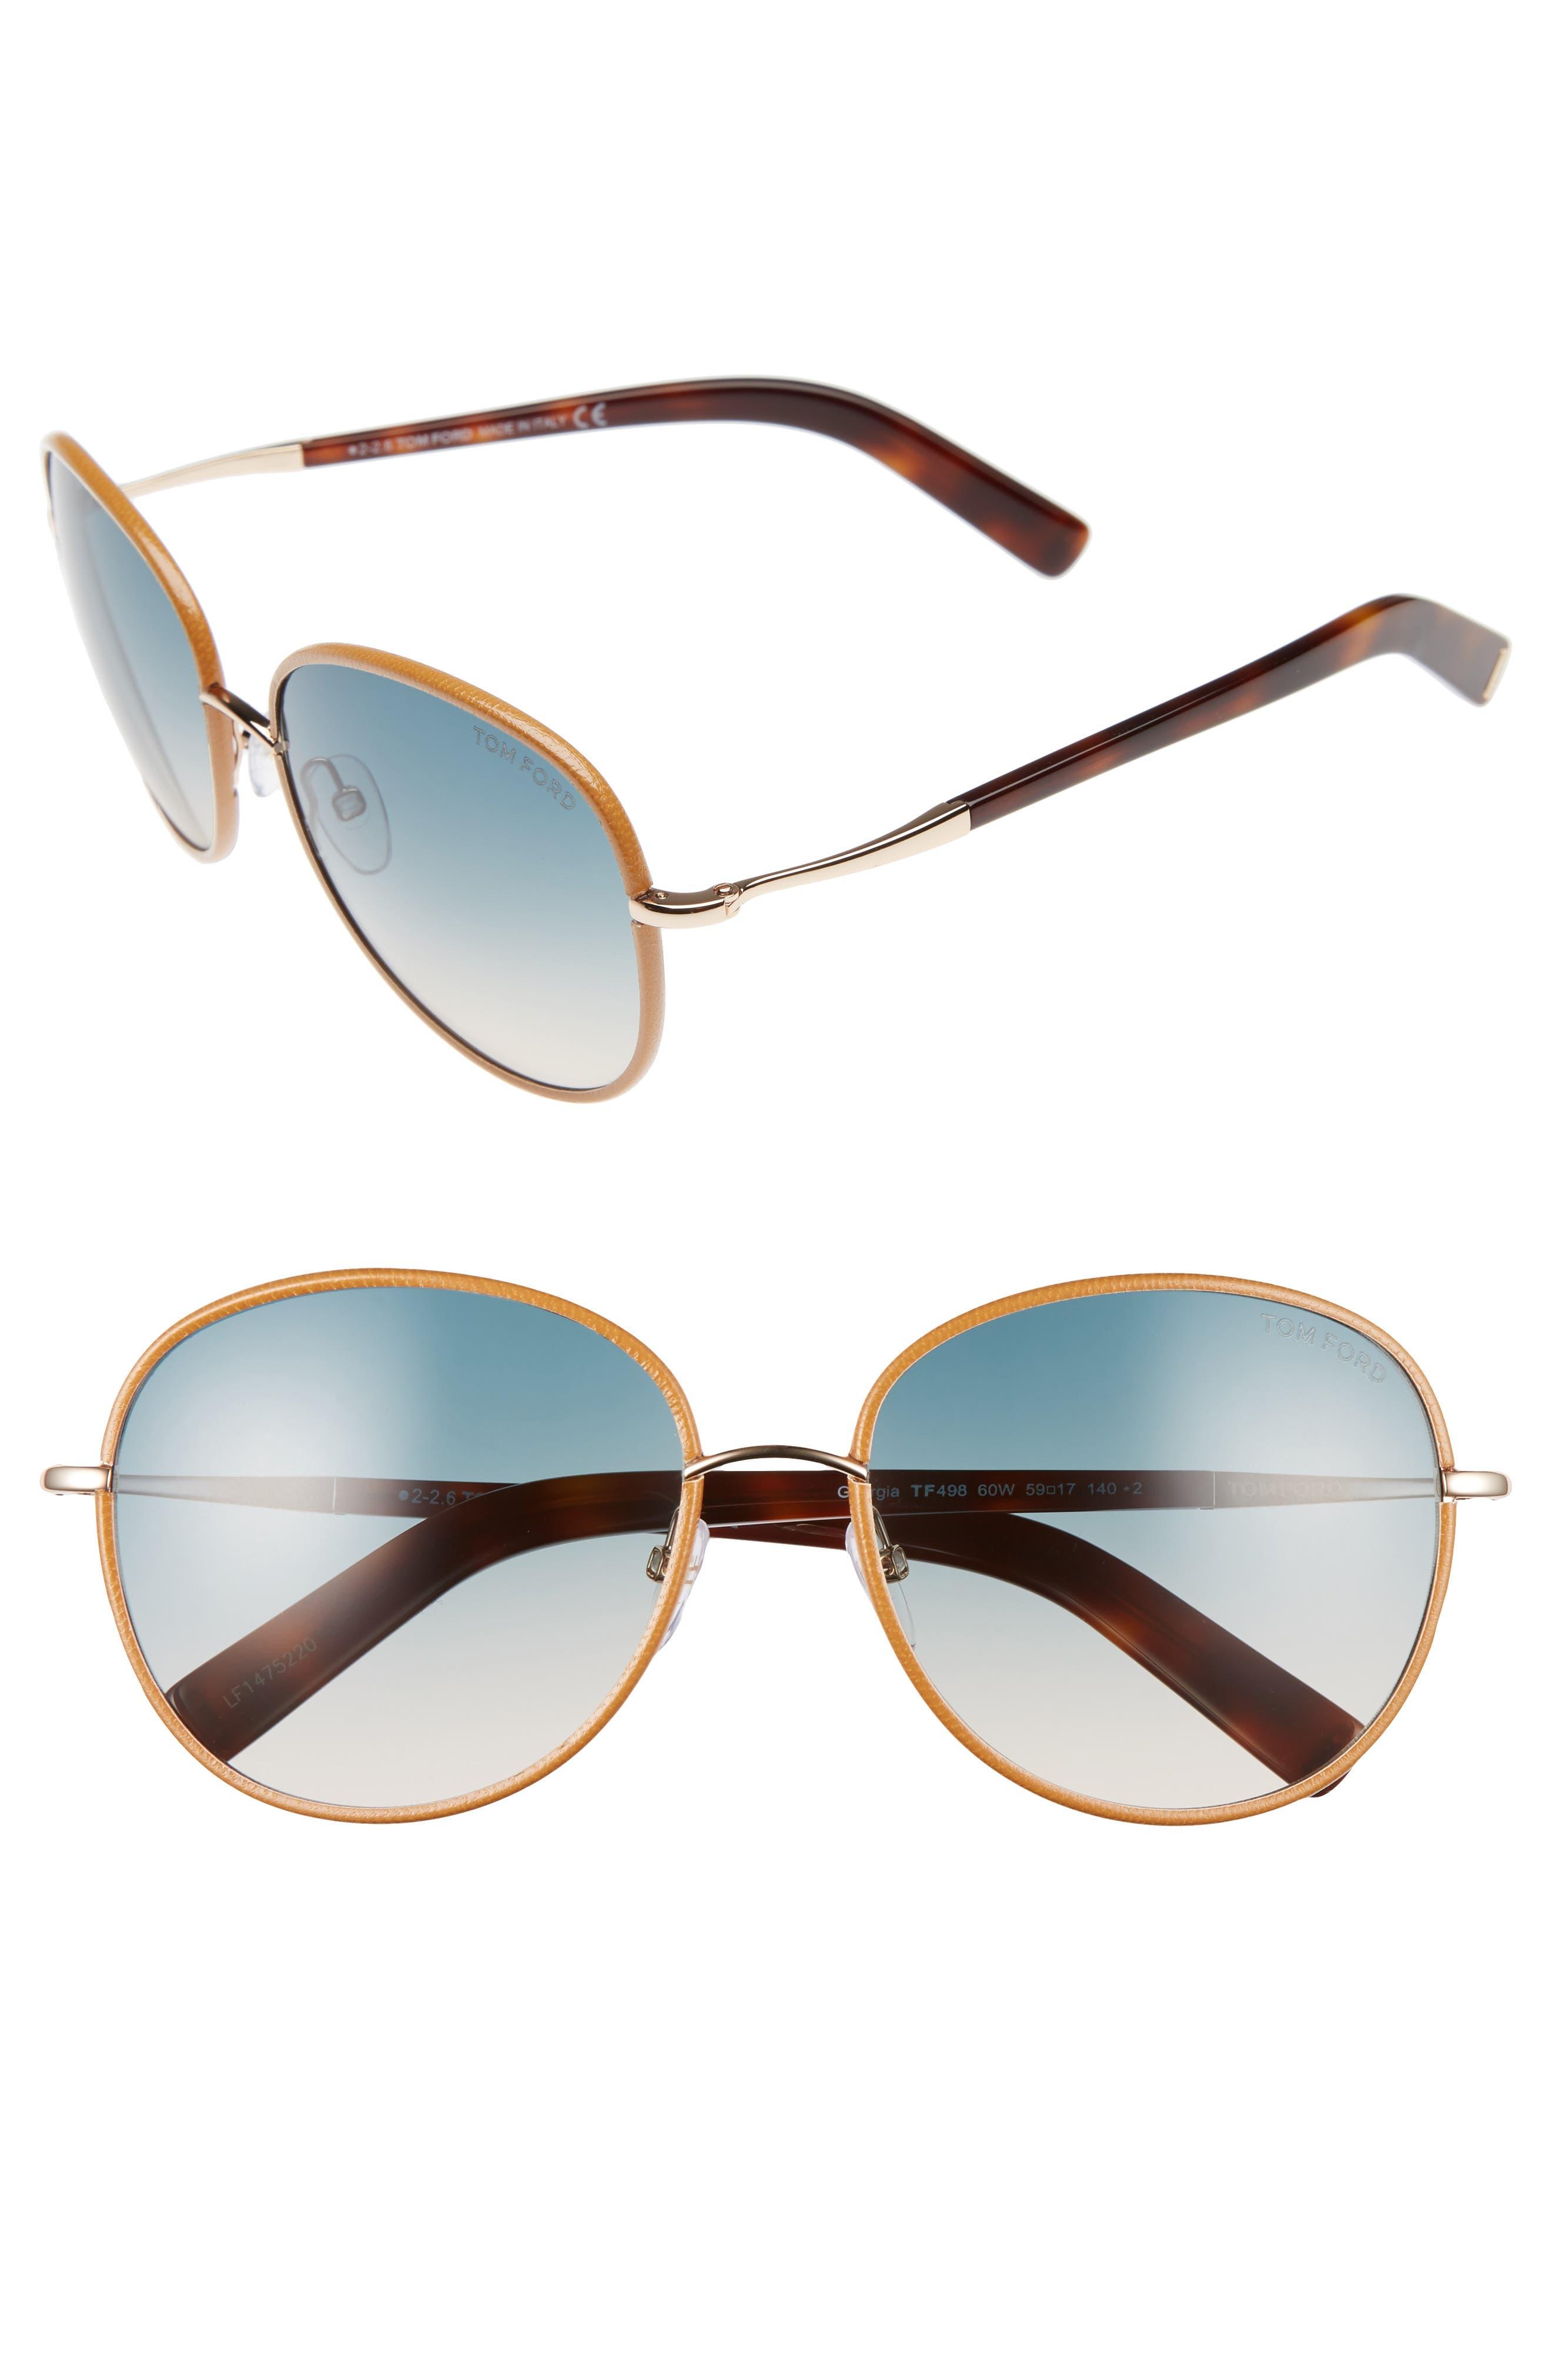 Georgia 59mm Sunglasses,                             Alternate thumbnail 3, color,                             710